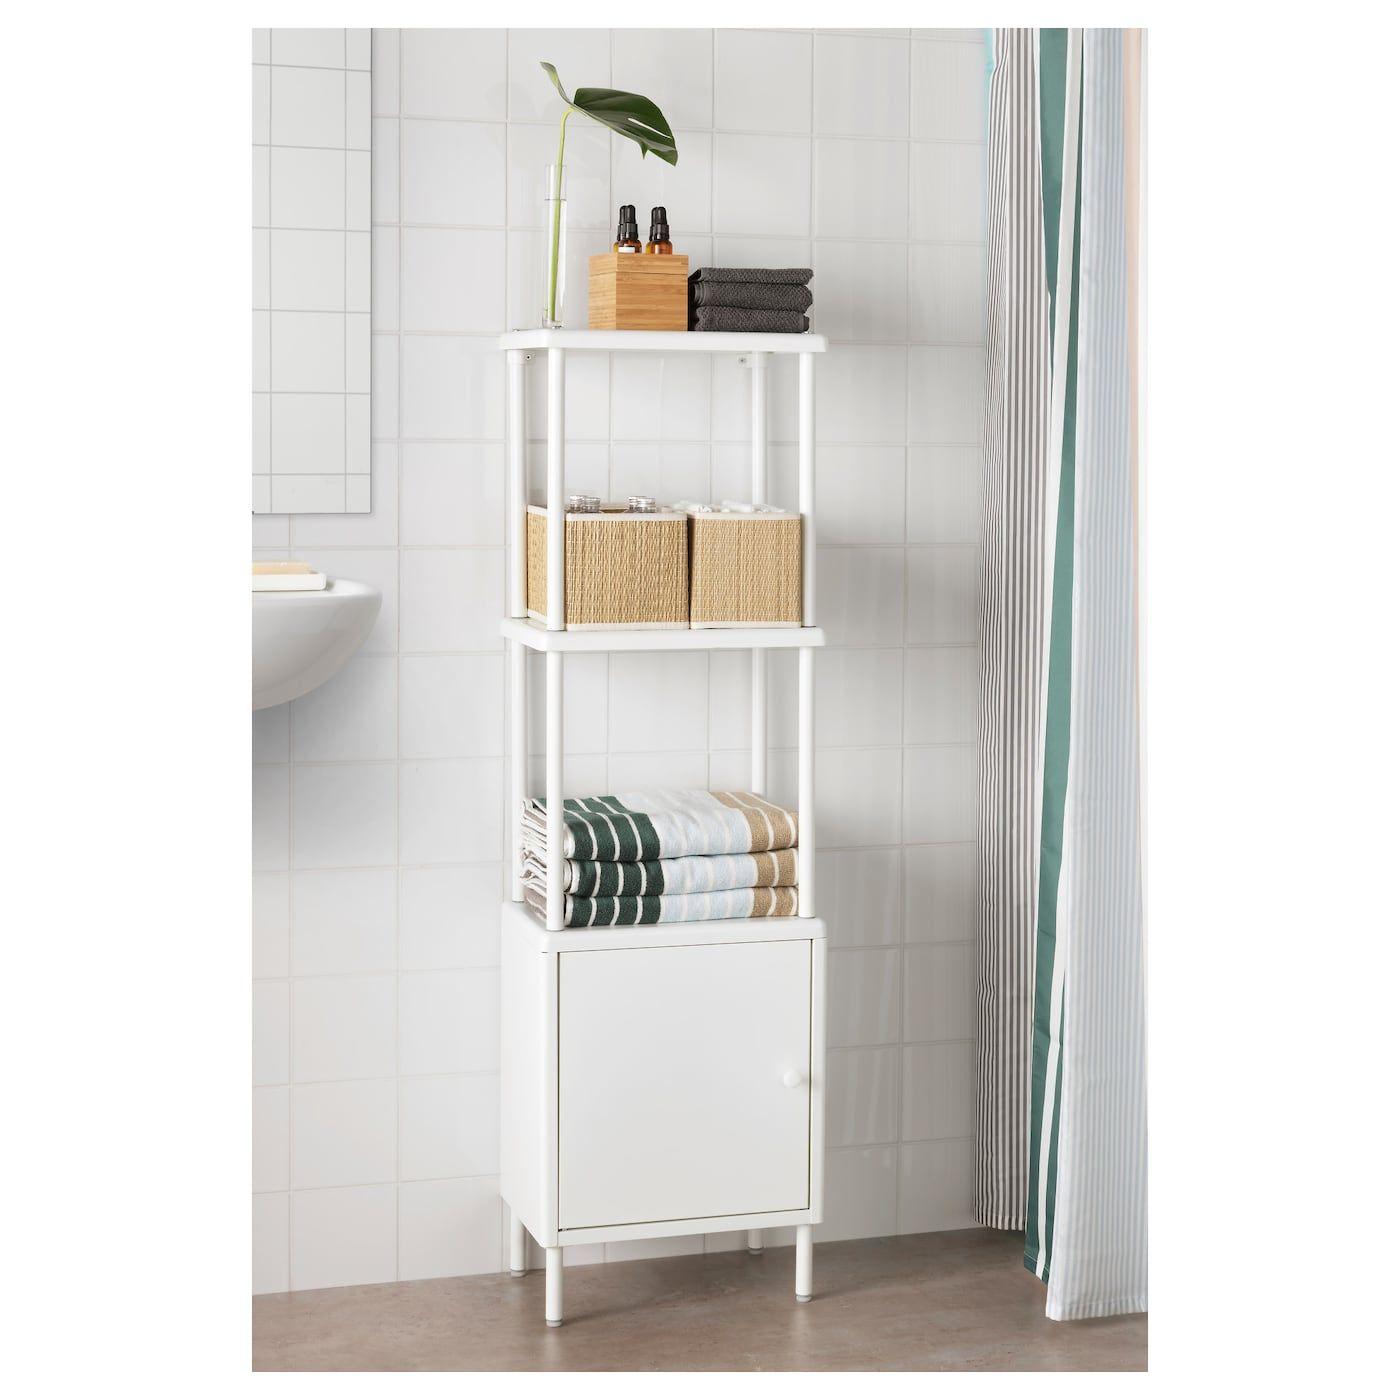 Dynan Shelving Unit With Cabinet White 40x27x134 Cm Ikea Shelving Unit Shelves Cabinet Doors